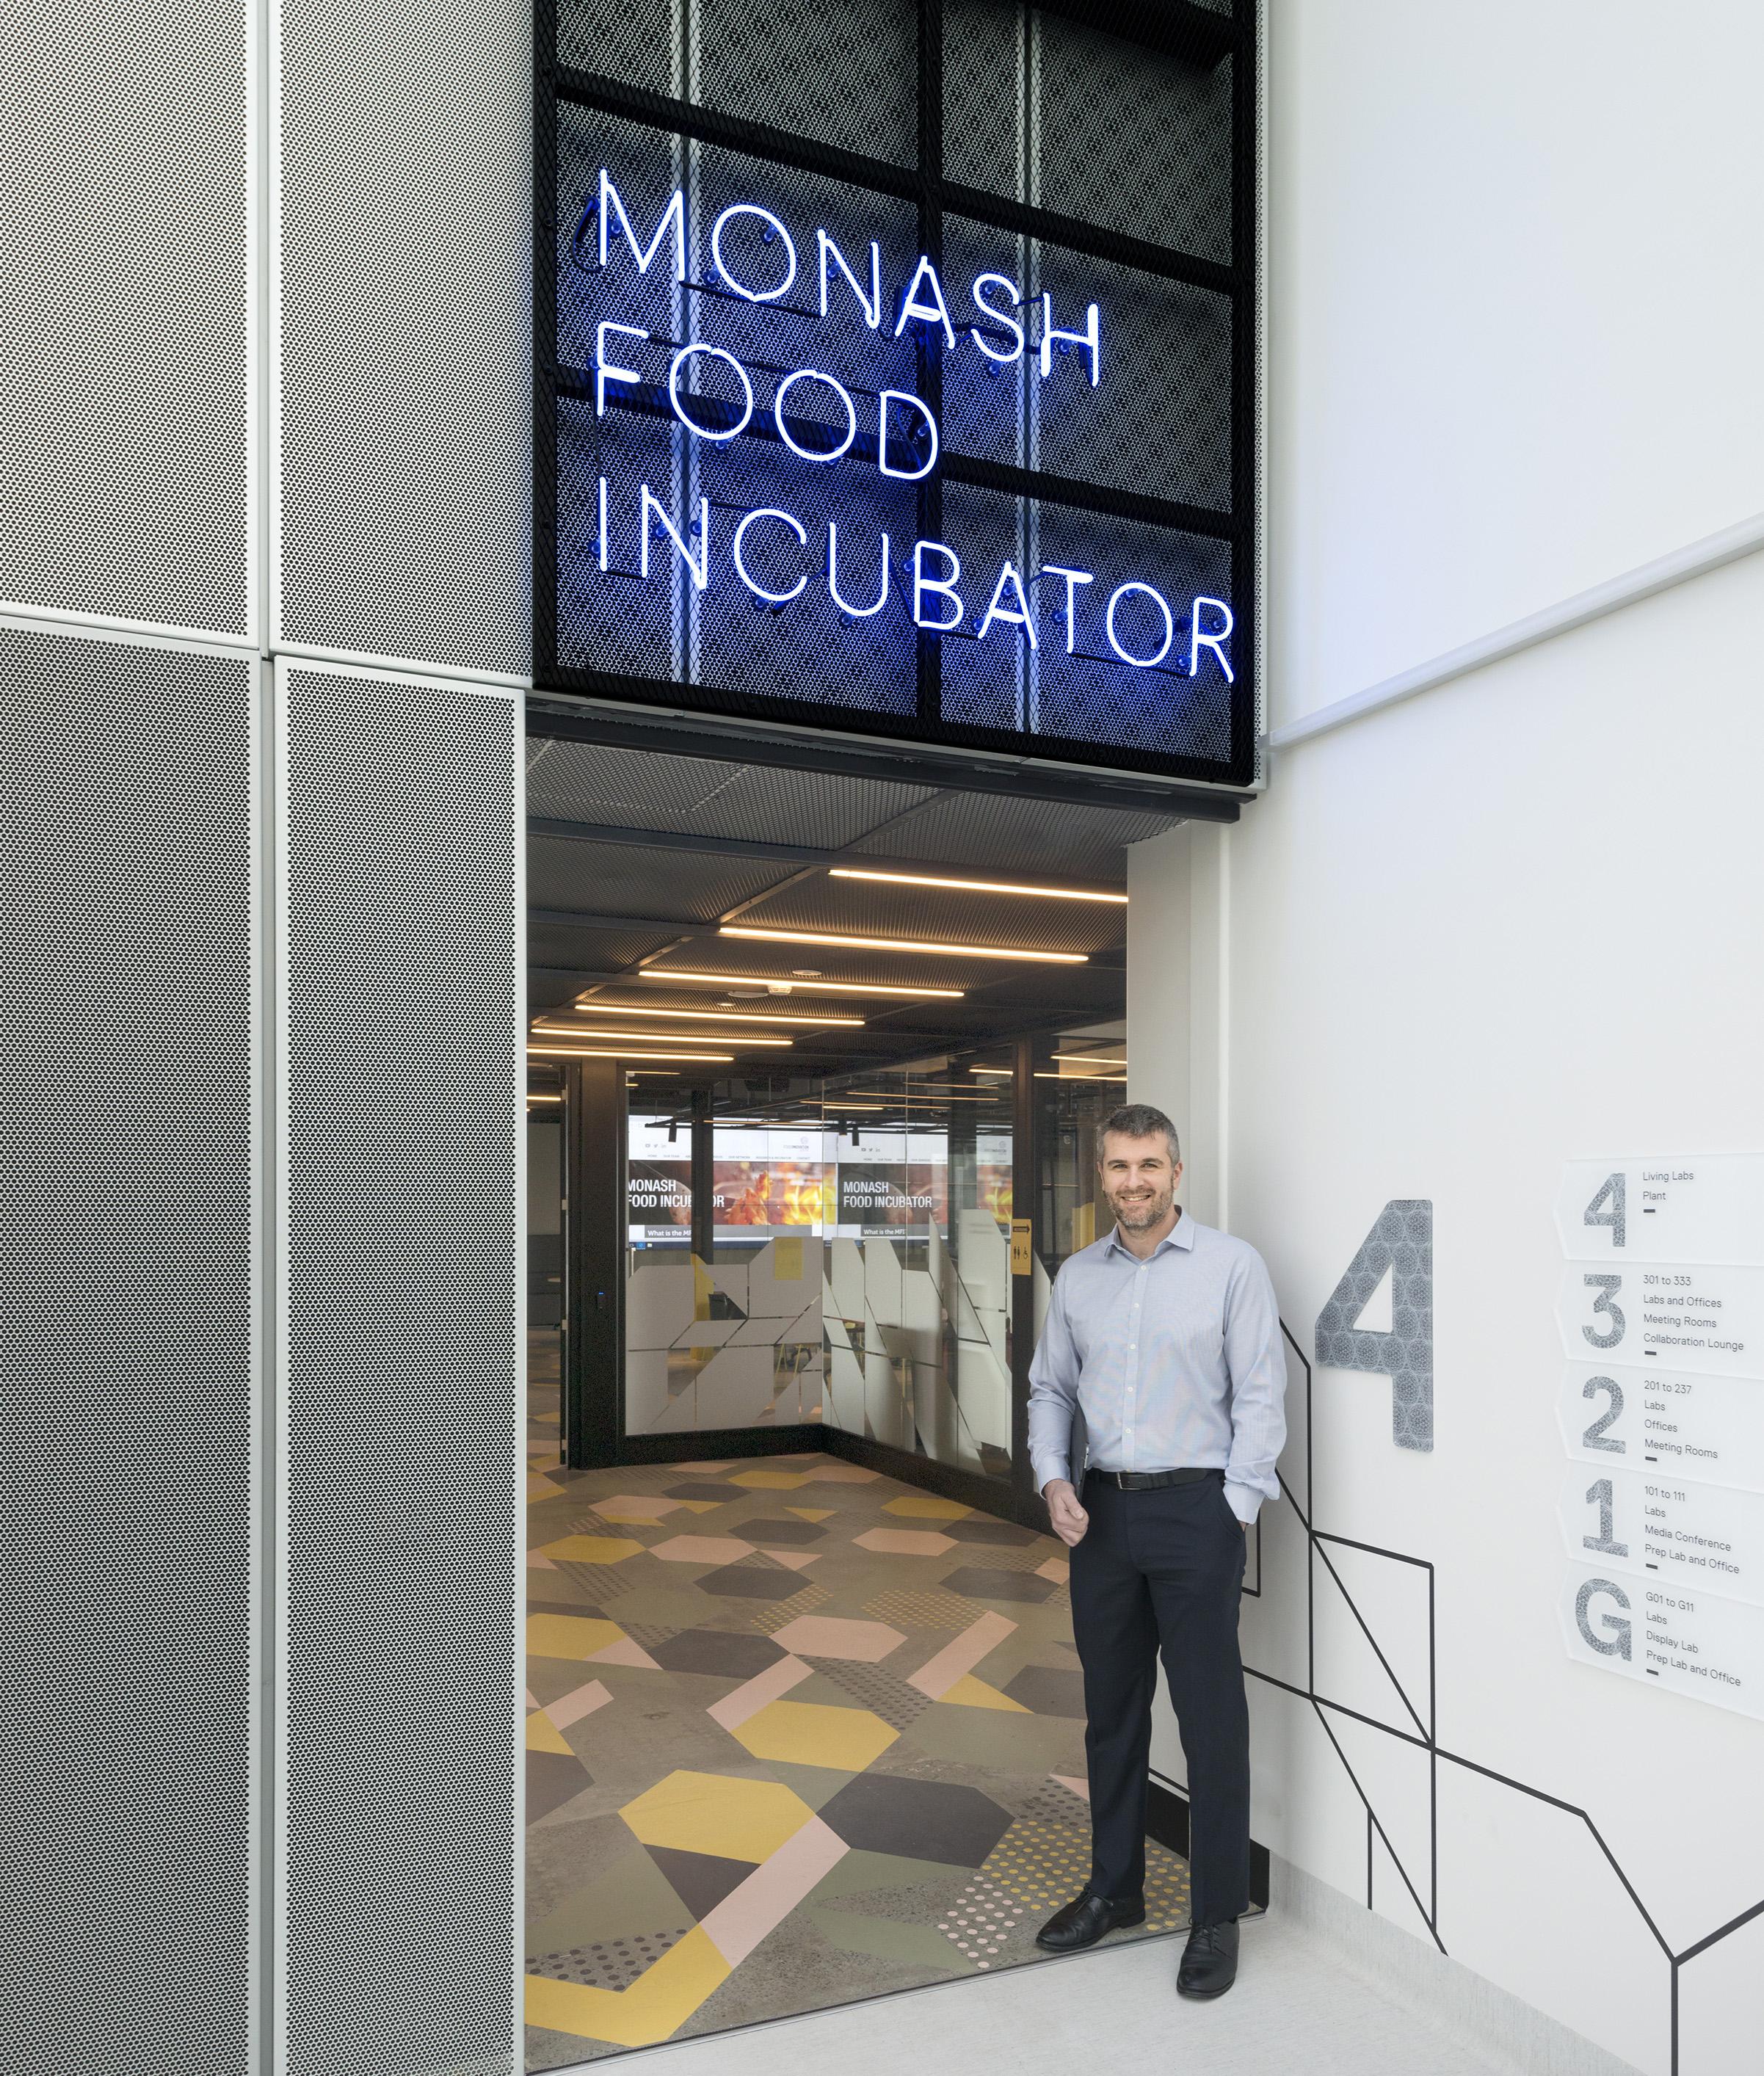 The Monash Food Incubator